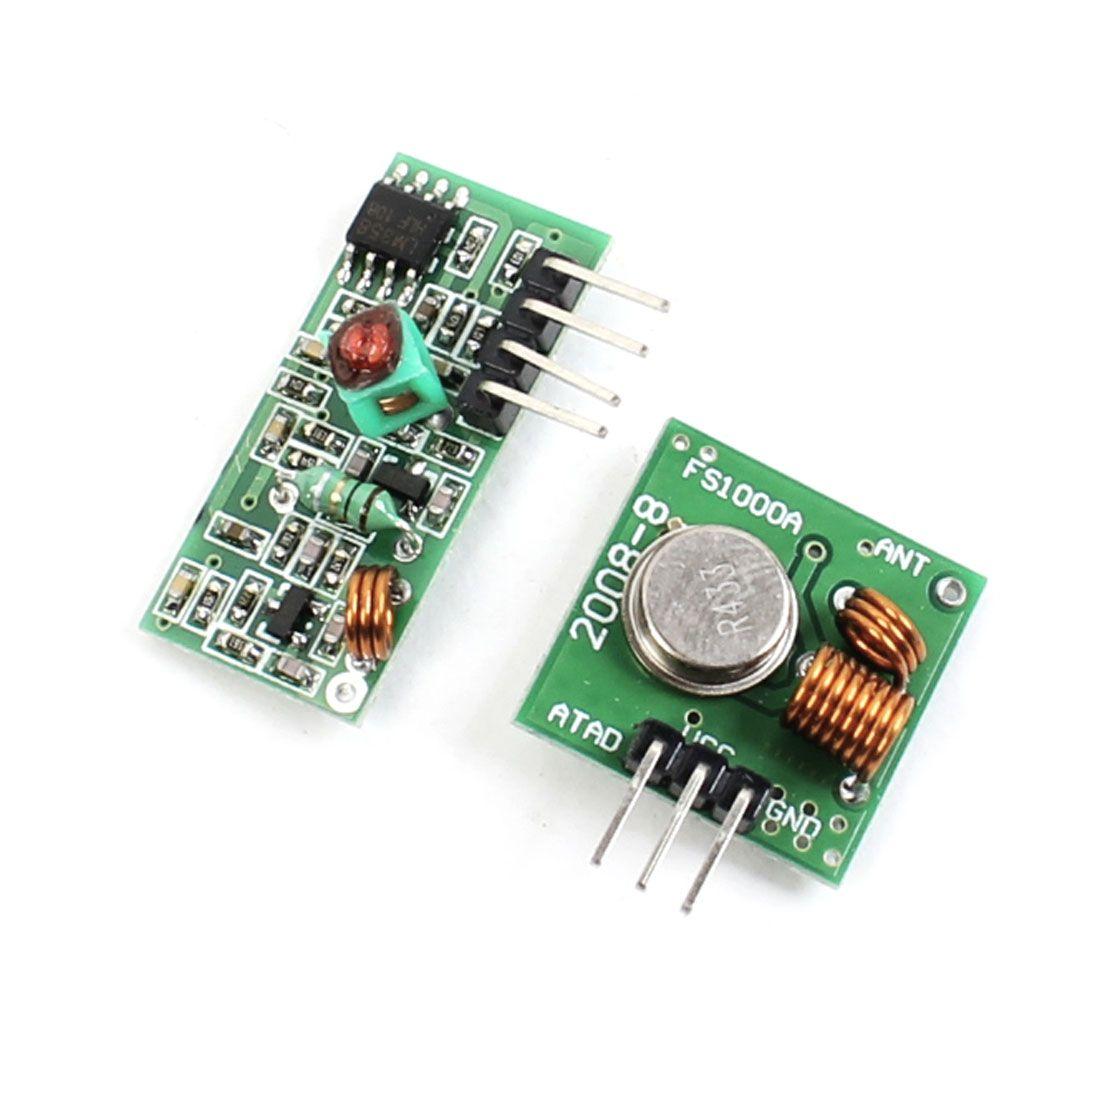 2017 433mhz wl rf transmitter receiver module link kit arm mcu wireless from ux168car. Black Bedroom Furniture Sets. Home Design Ideas